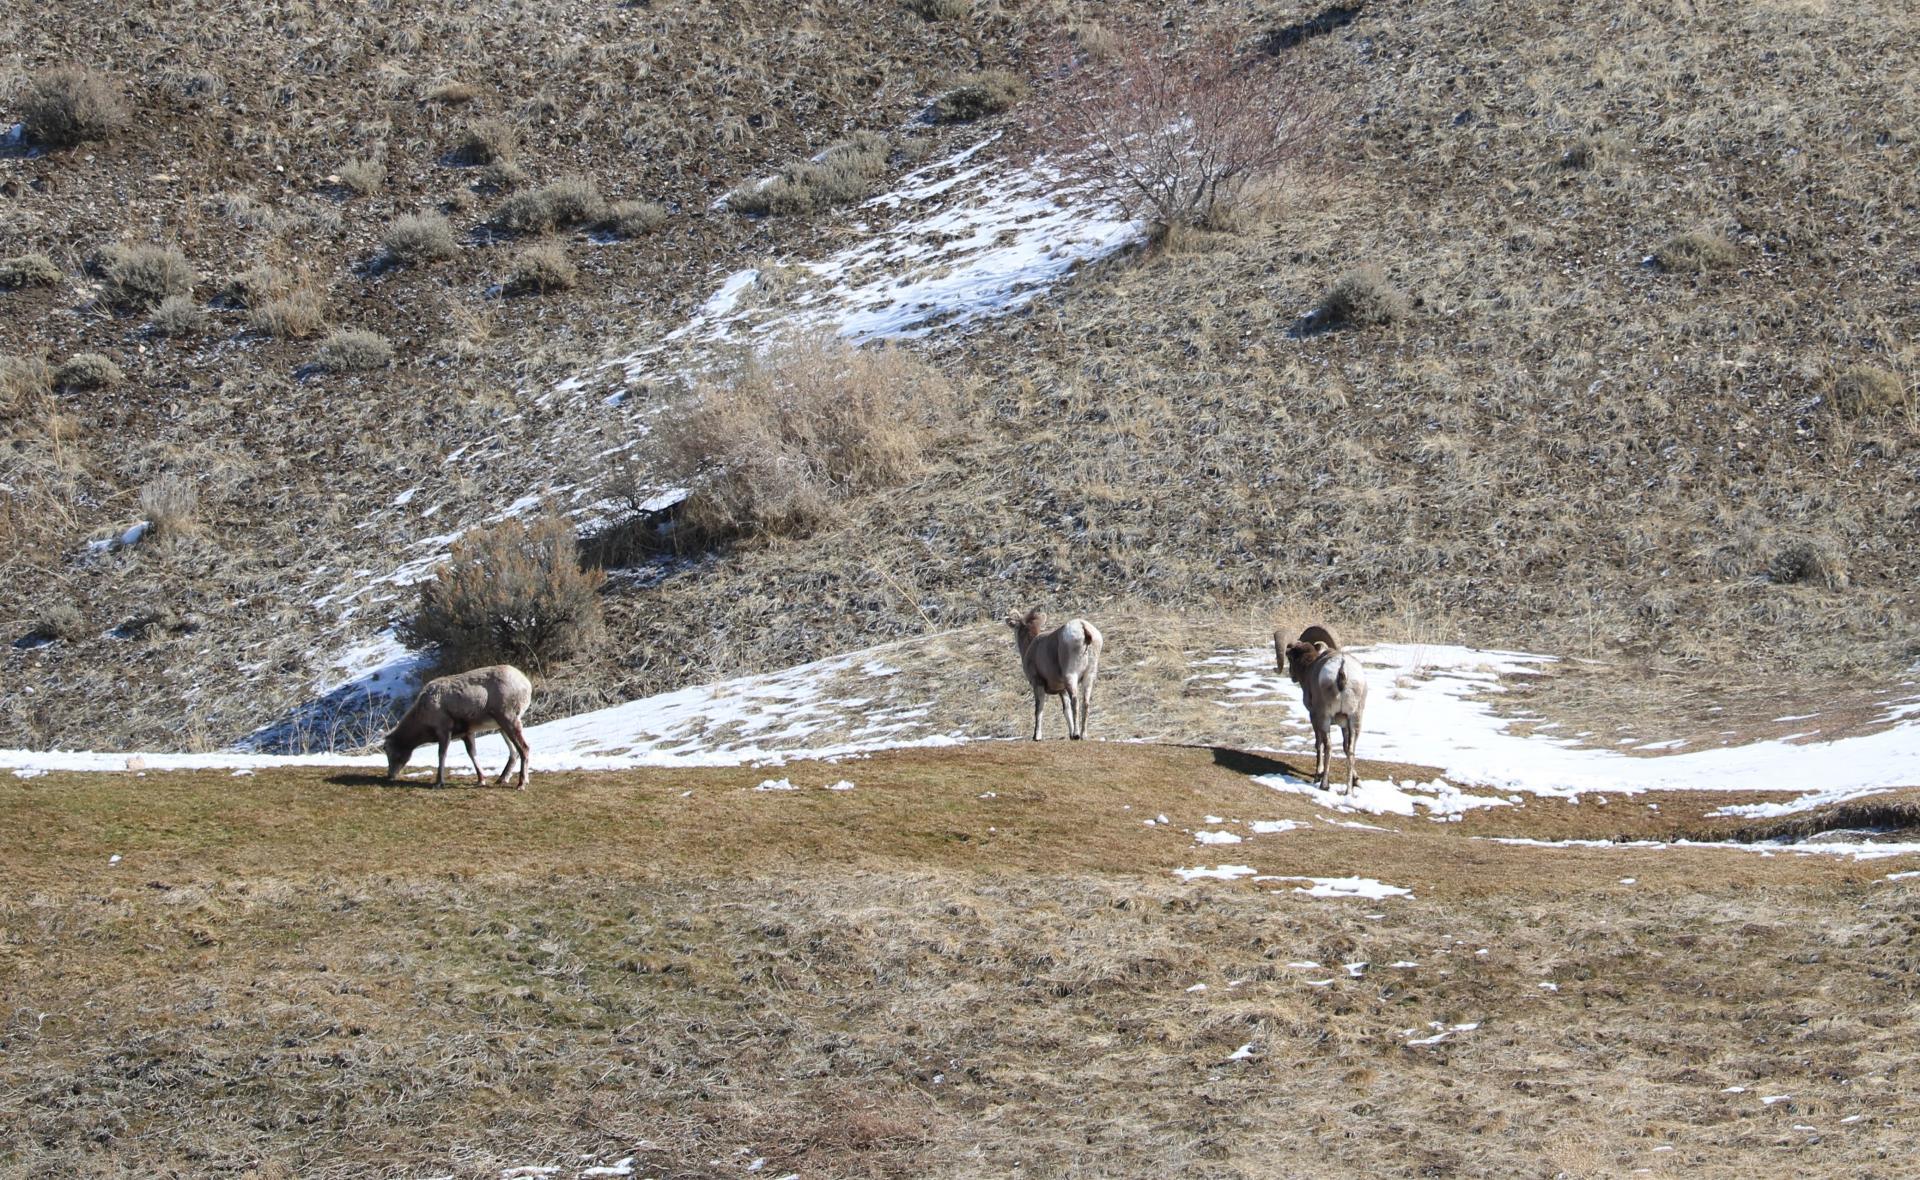 Click image for larger version  Name:Cedar Hills Sheep 4.jpg Views:57 Size:638.0 KB ID:146363